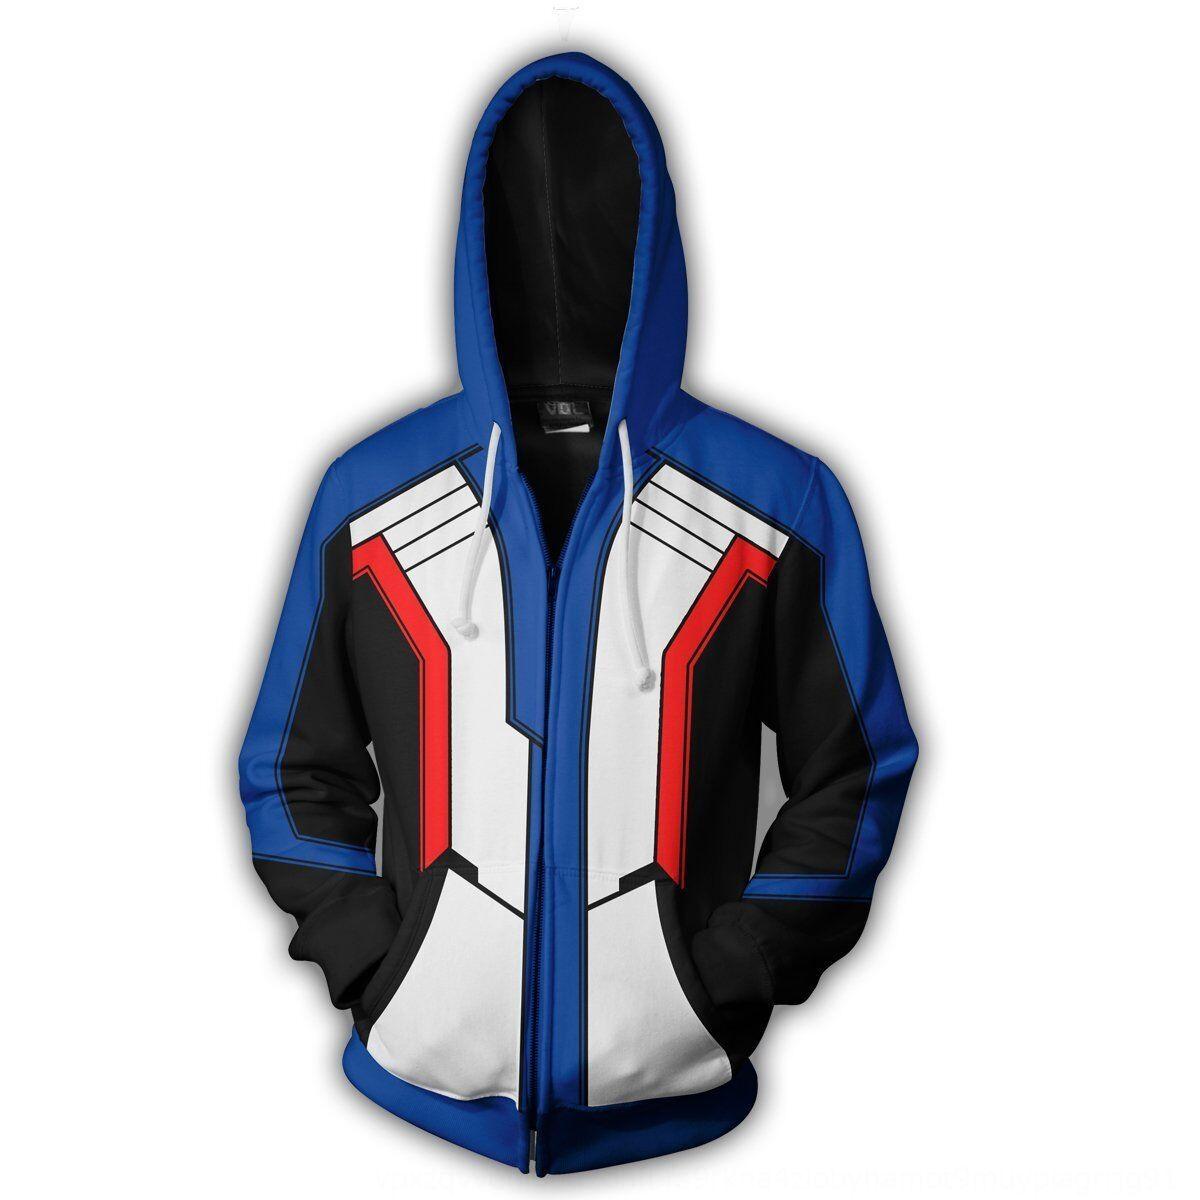 Cosplay Yeni hoodiezipper kapşonlu garde DVA 3D fermuar hırka Hoodie Cospla baskılı avant izle hırka Yeni izle avangart DVA 3D baskılı